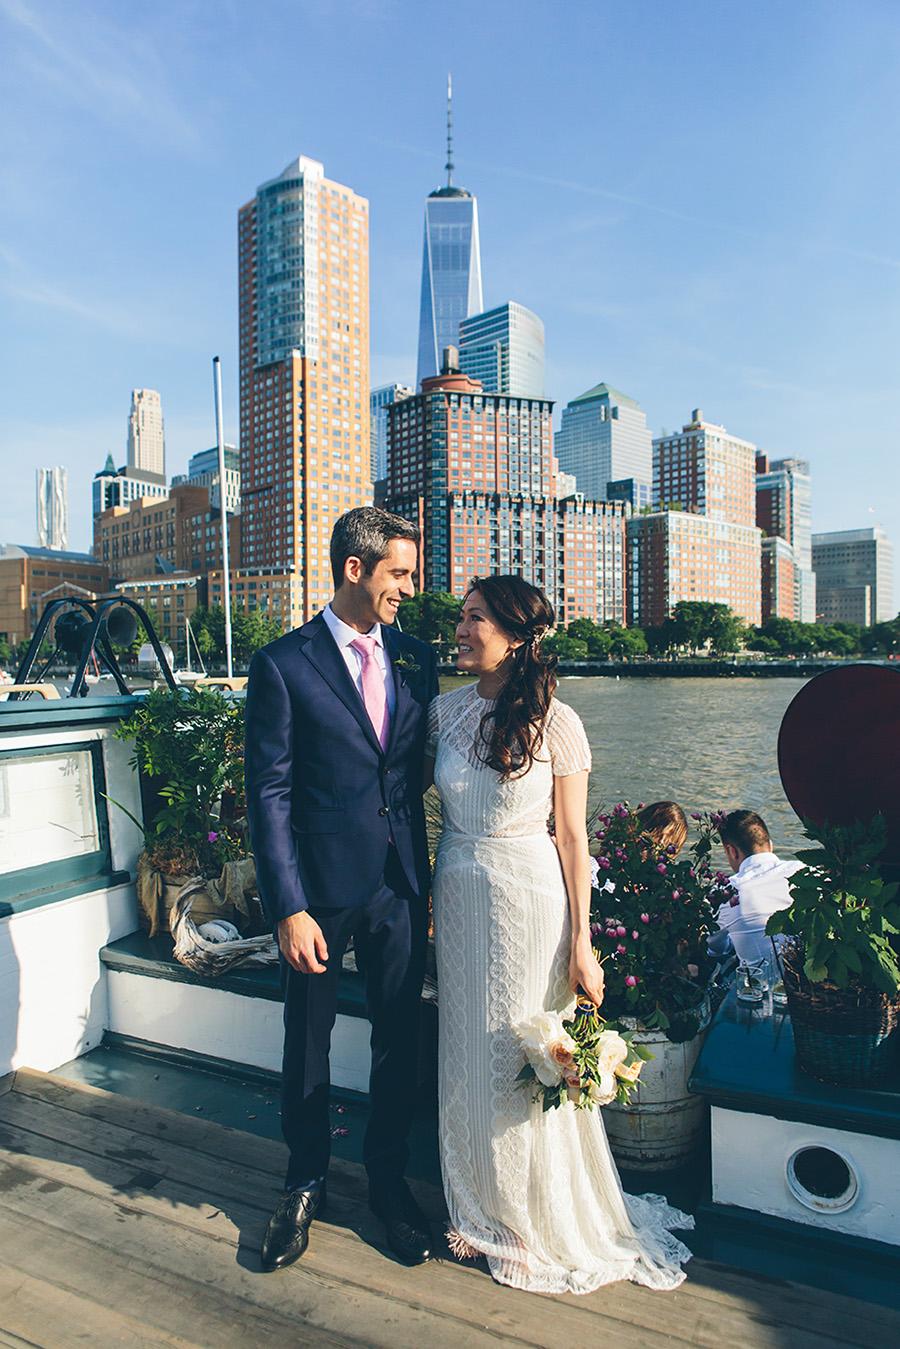 NEW-YORK-CITY-WEDDING-PHOTOGRAPHER-WEST-VILLAGE-GREENWICH-HOTEL-GRAND-BANKS-PIER-0060.jpg